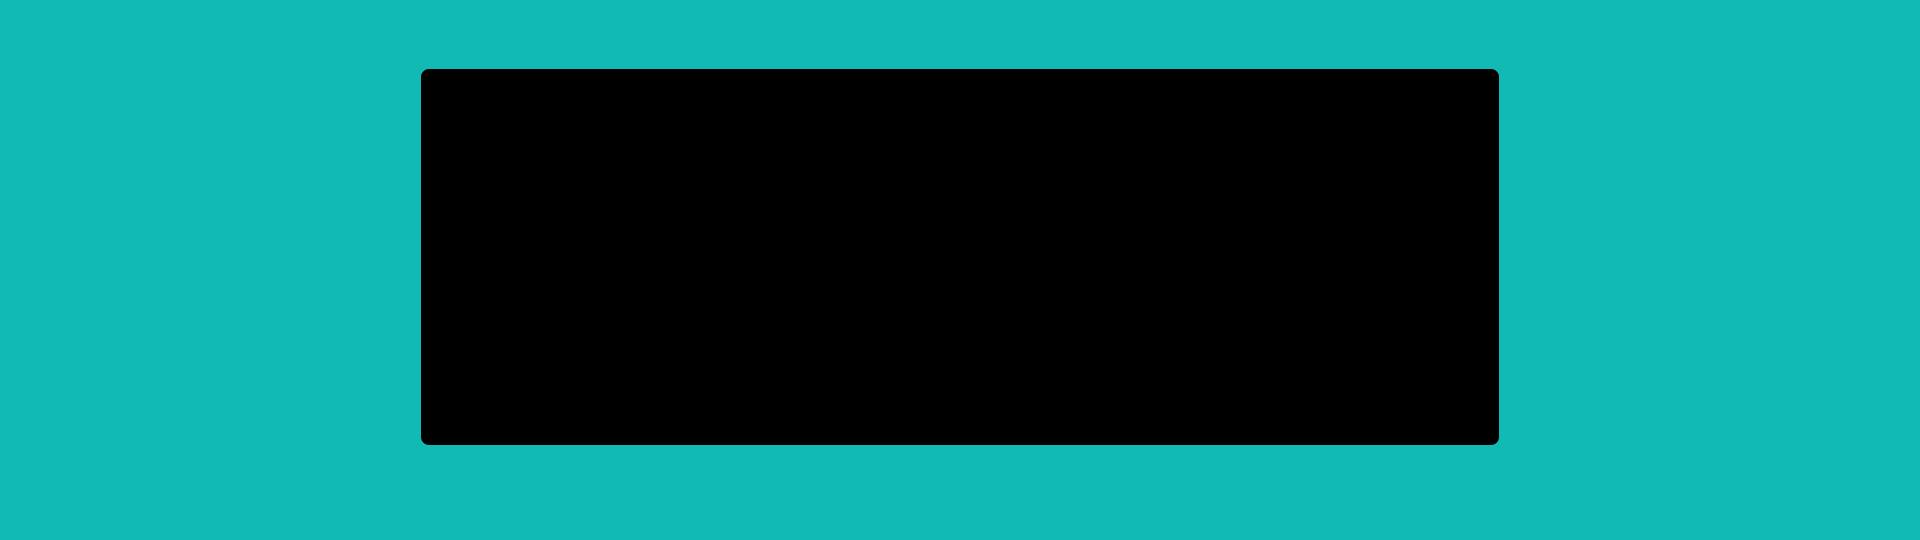 CATEGORY-SDA-KISINDIRIMIUTUSUPURGE169JENERIK-23-02